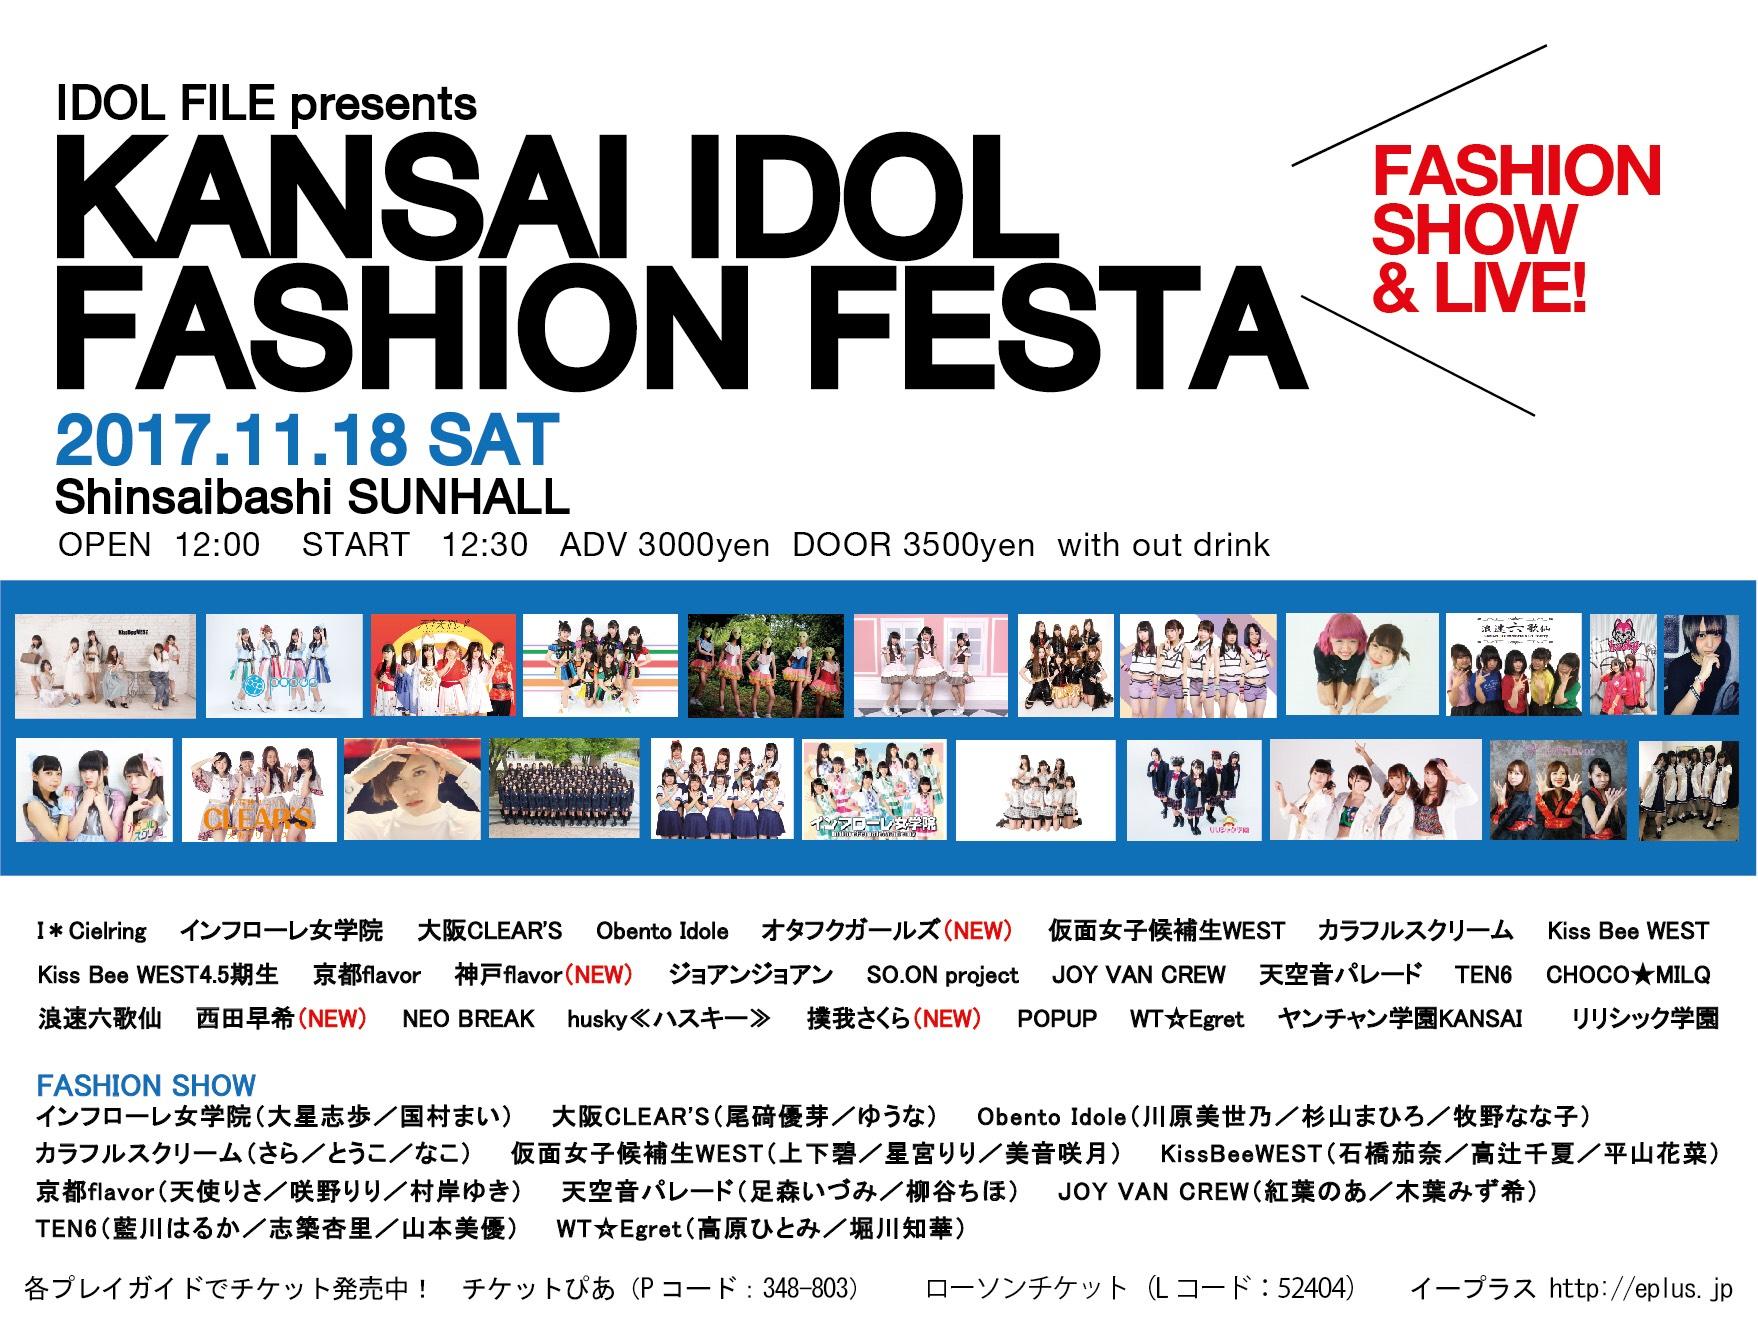 KANSAI IDOLFASHION FESTA